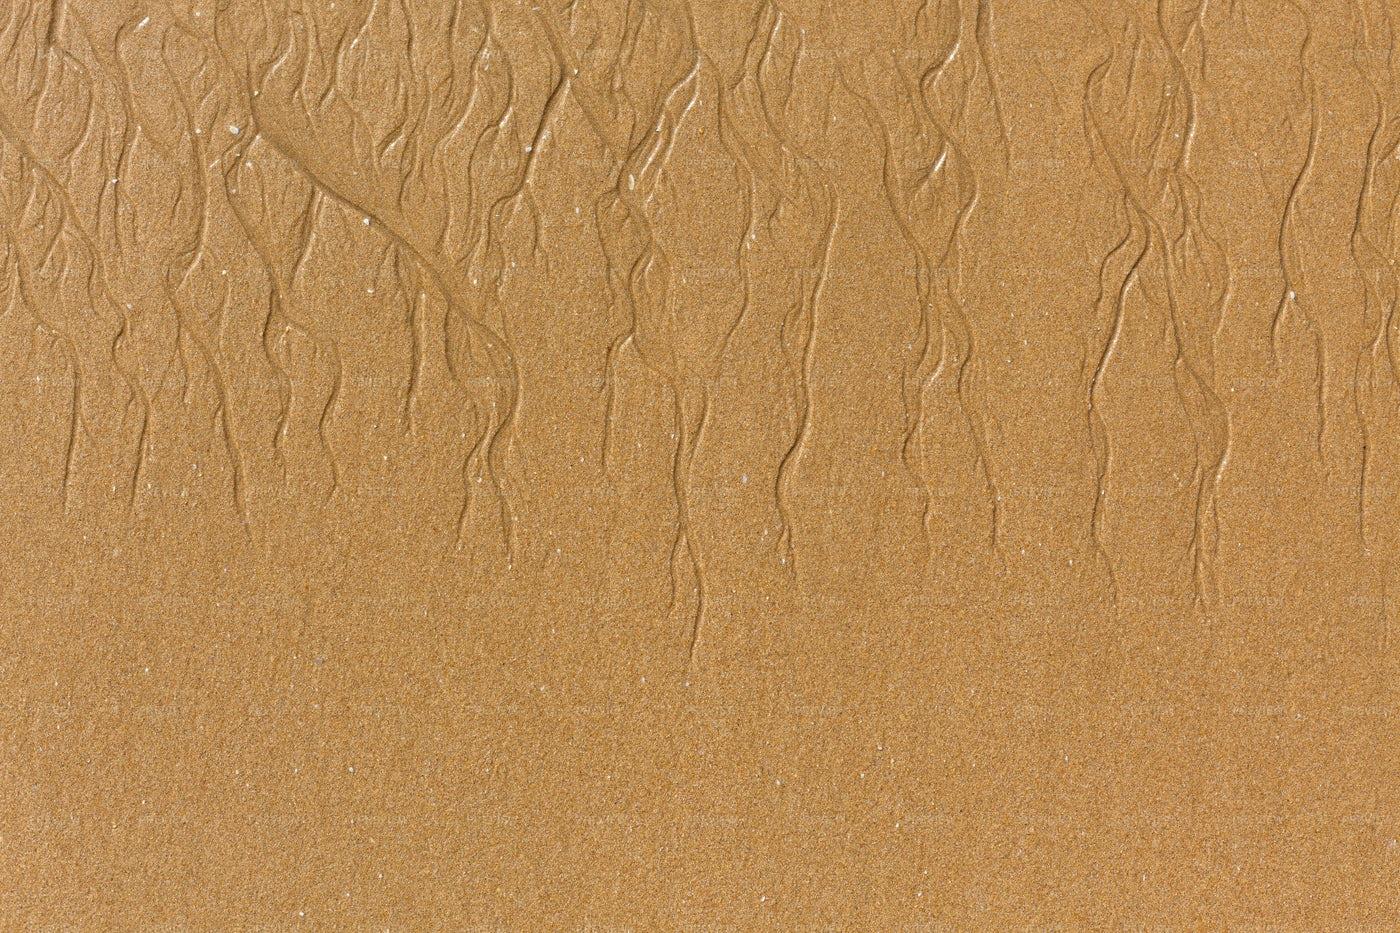 Yellow Sand Background: Stock Photos